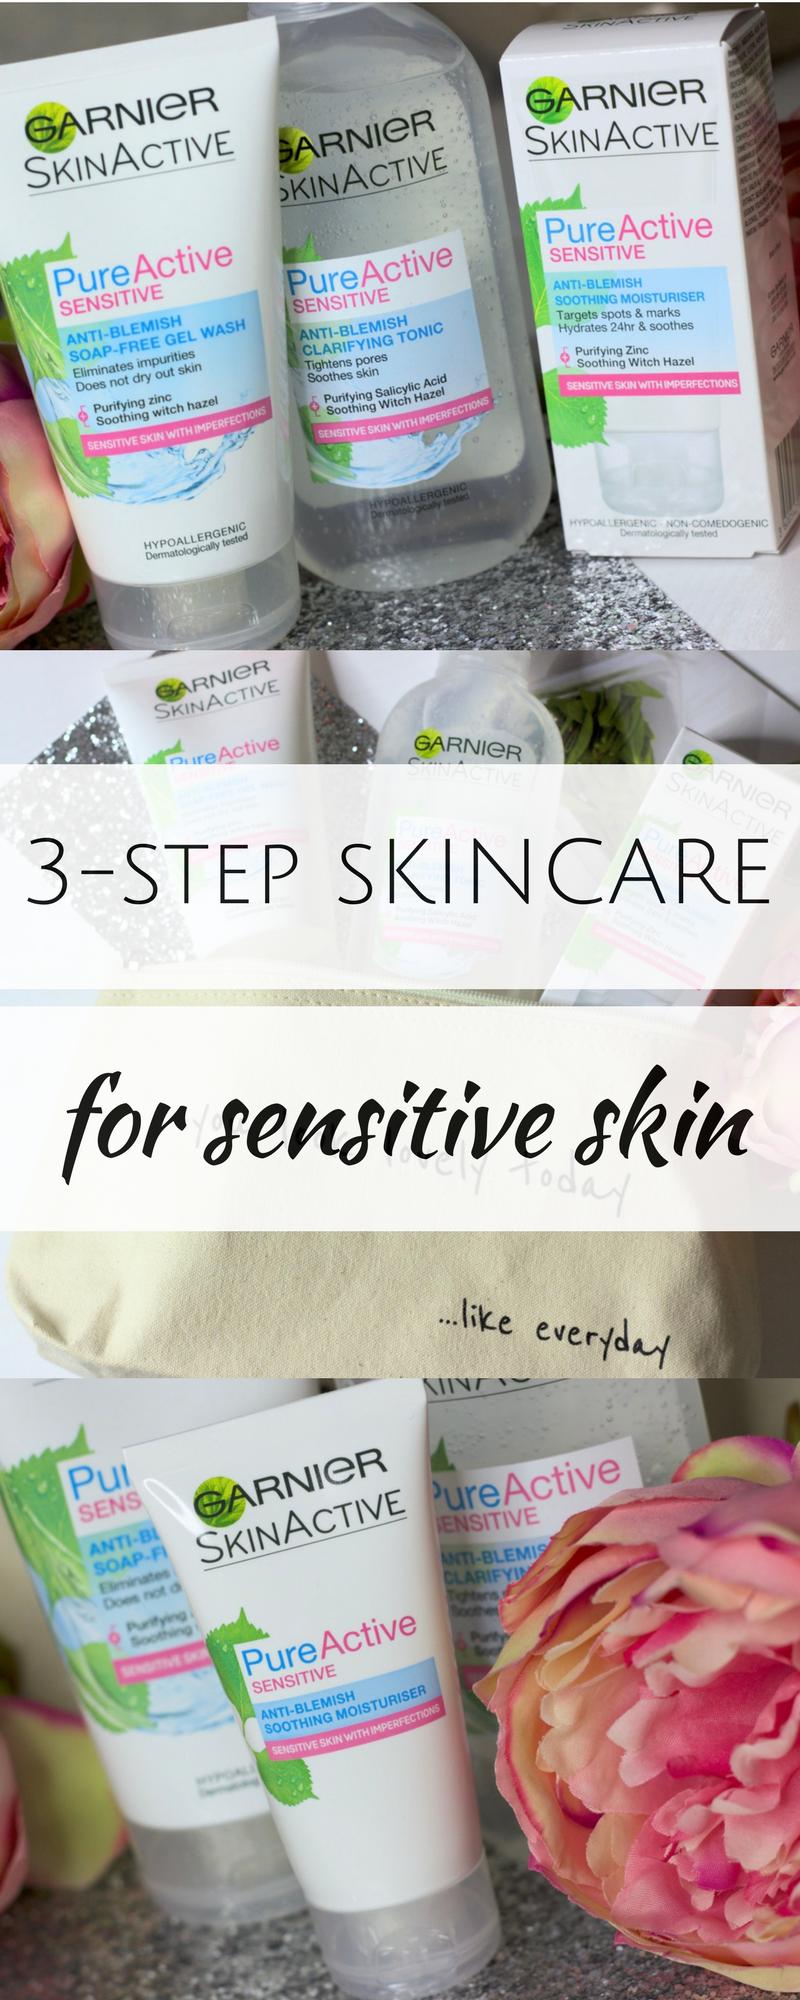 Garnier Pure Active Sensitive Range Skin Care Pinterest Anti Acne Cleansing Gel Foam 100 Ml